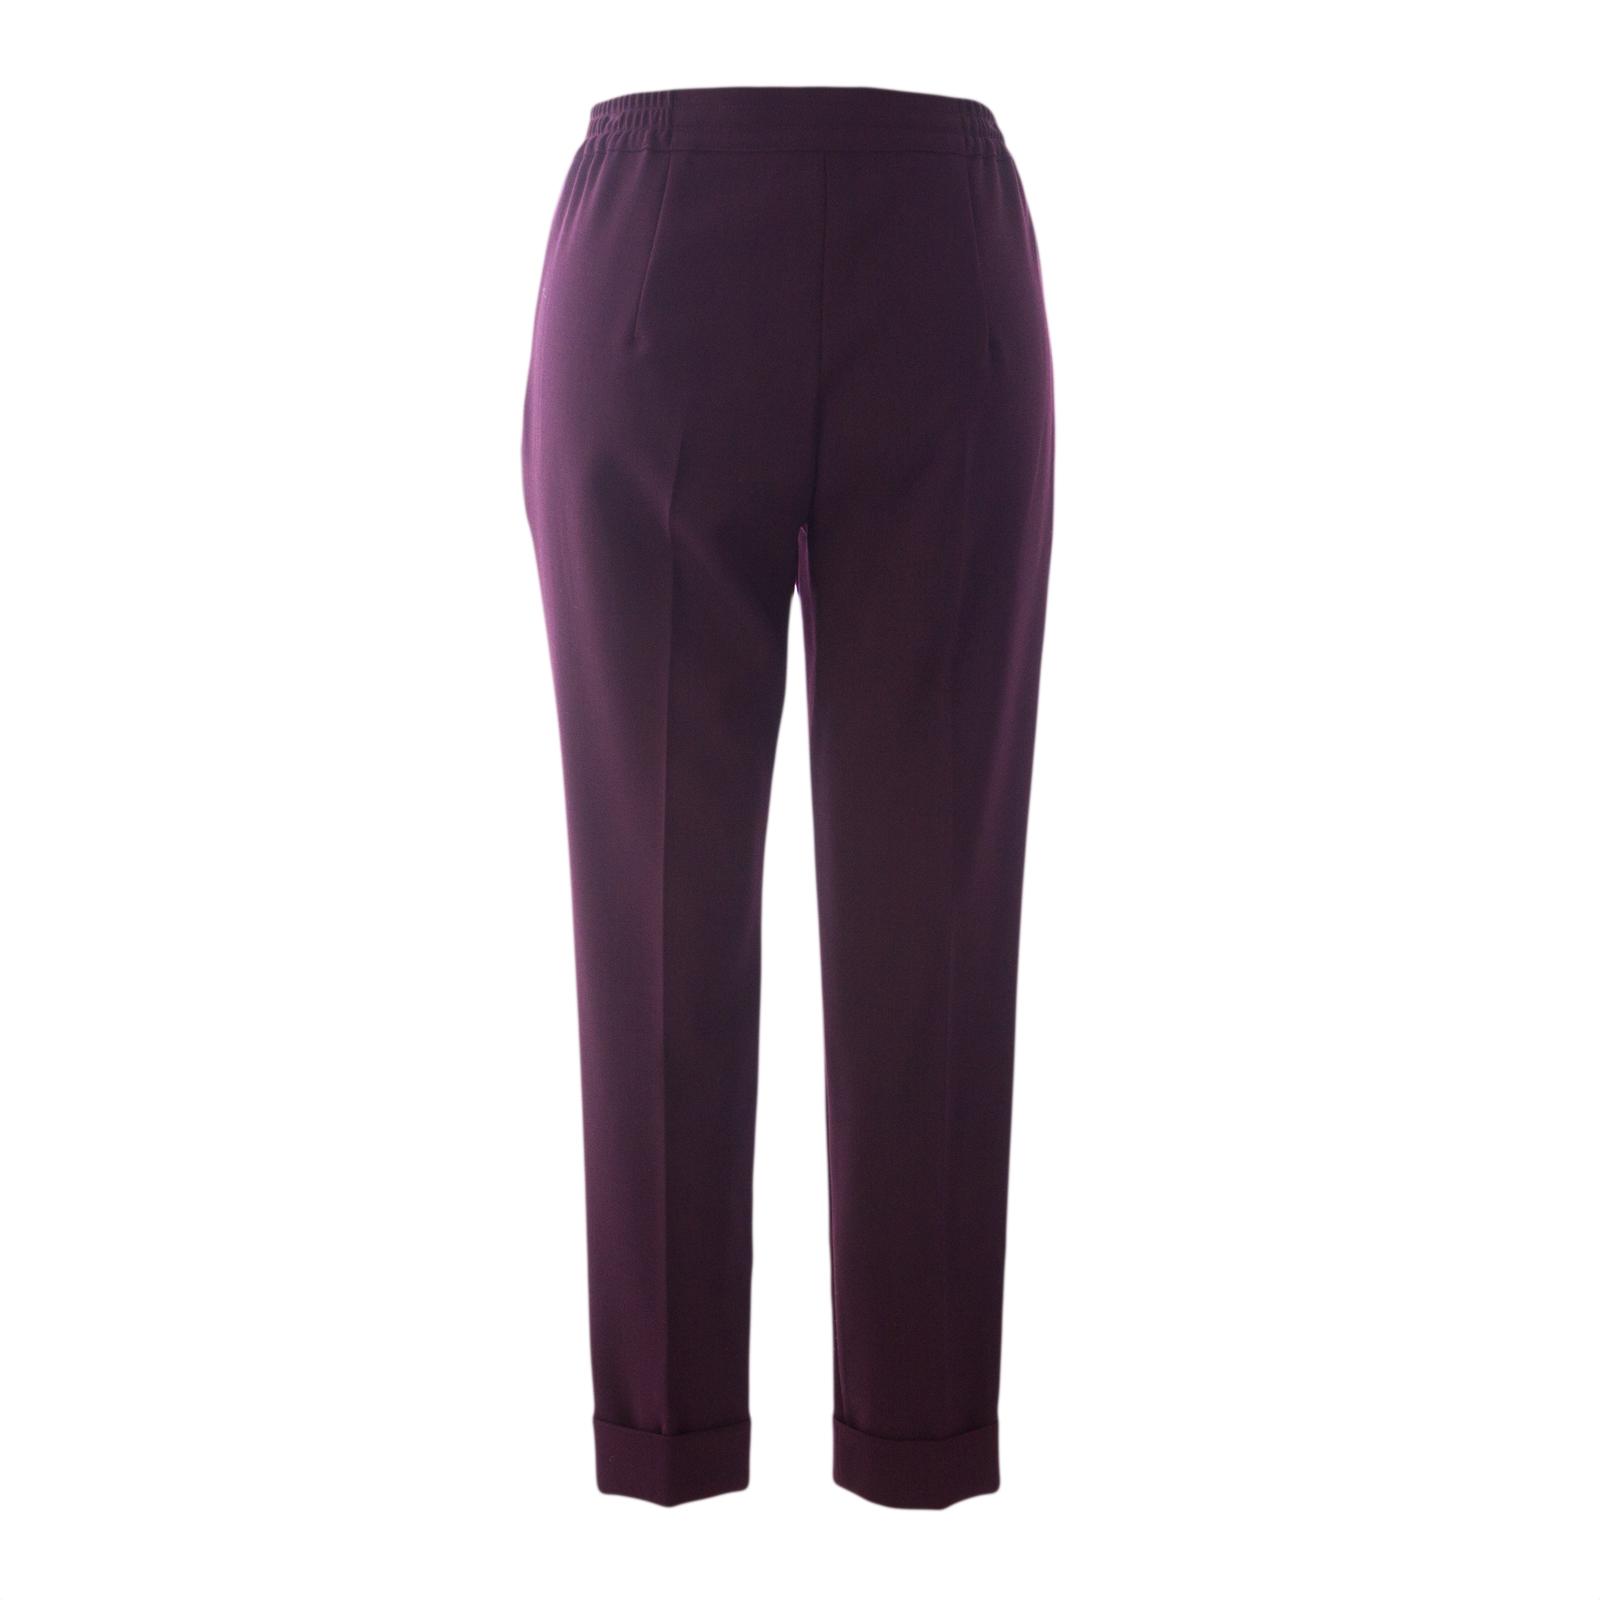 MAX MARA Women/'s Finale Turquoise Floral Silk Drawstring Pants $595 NWT